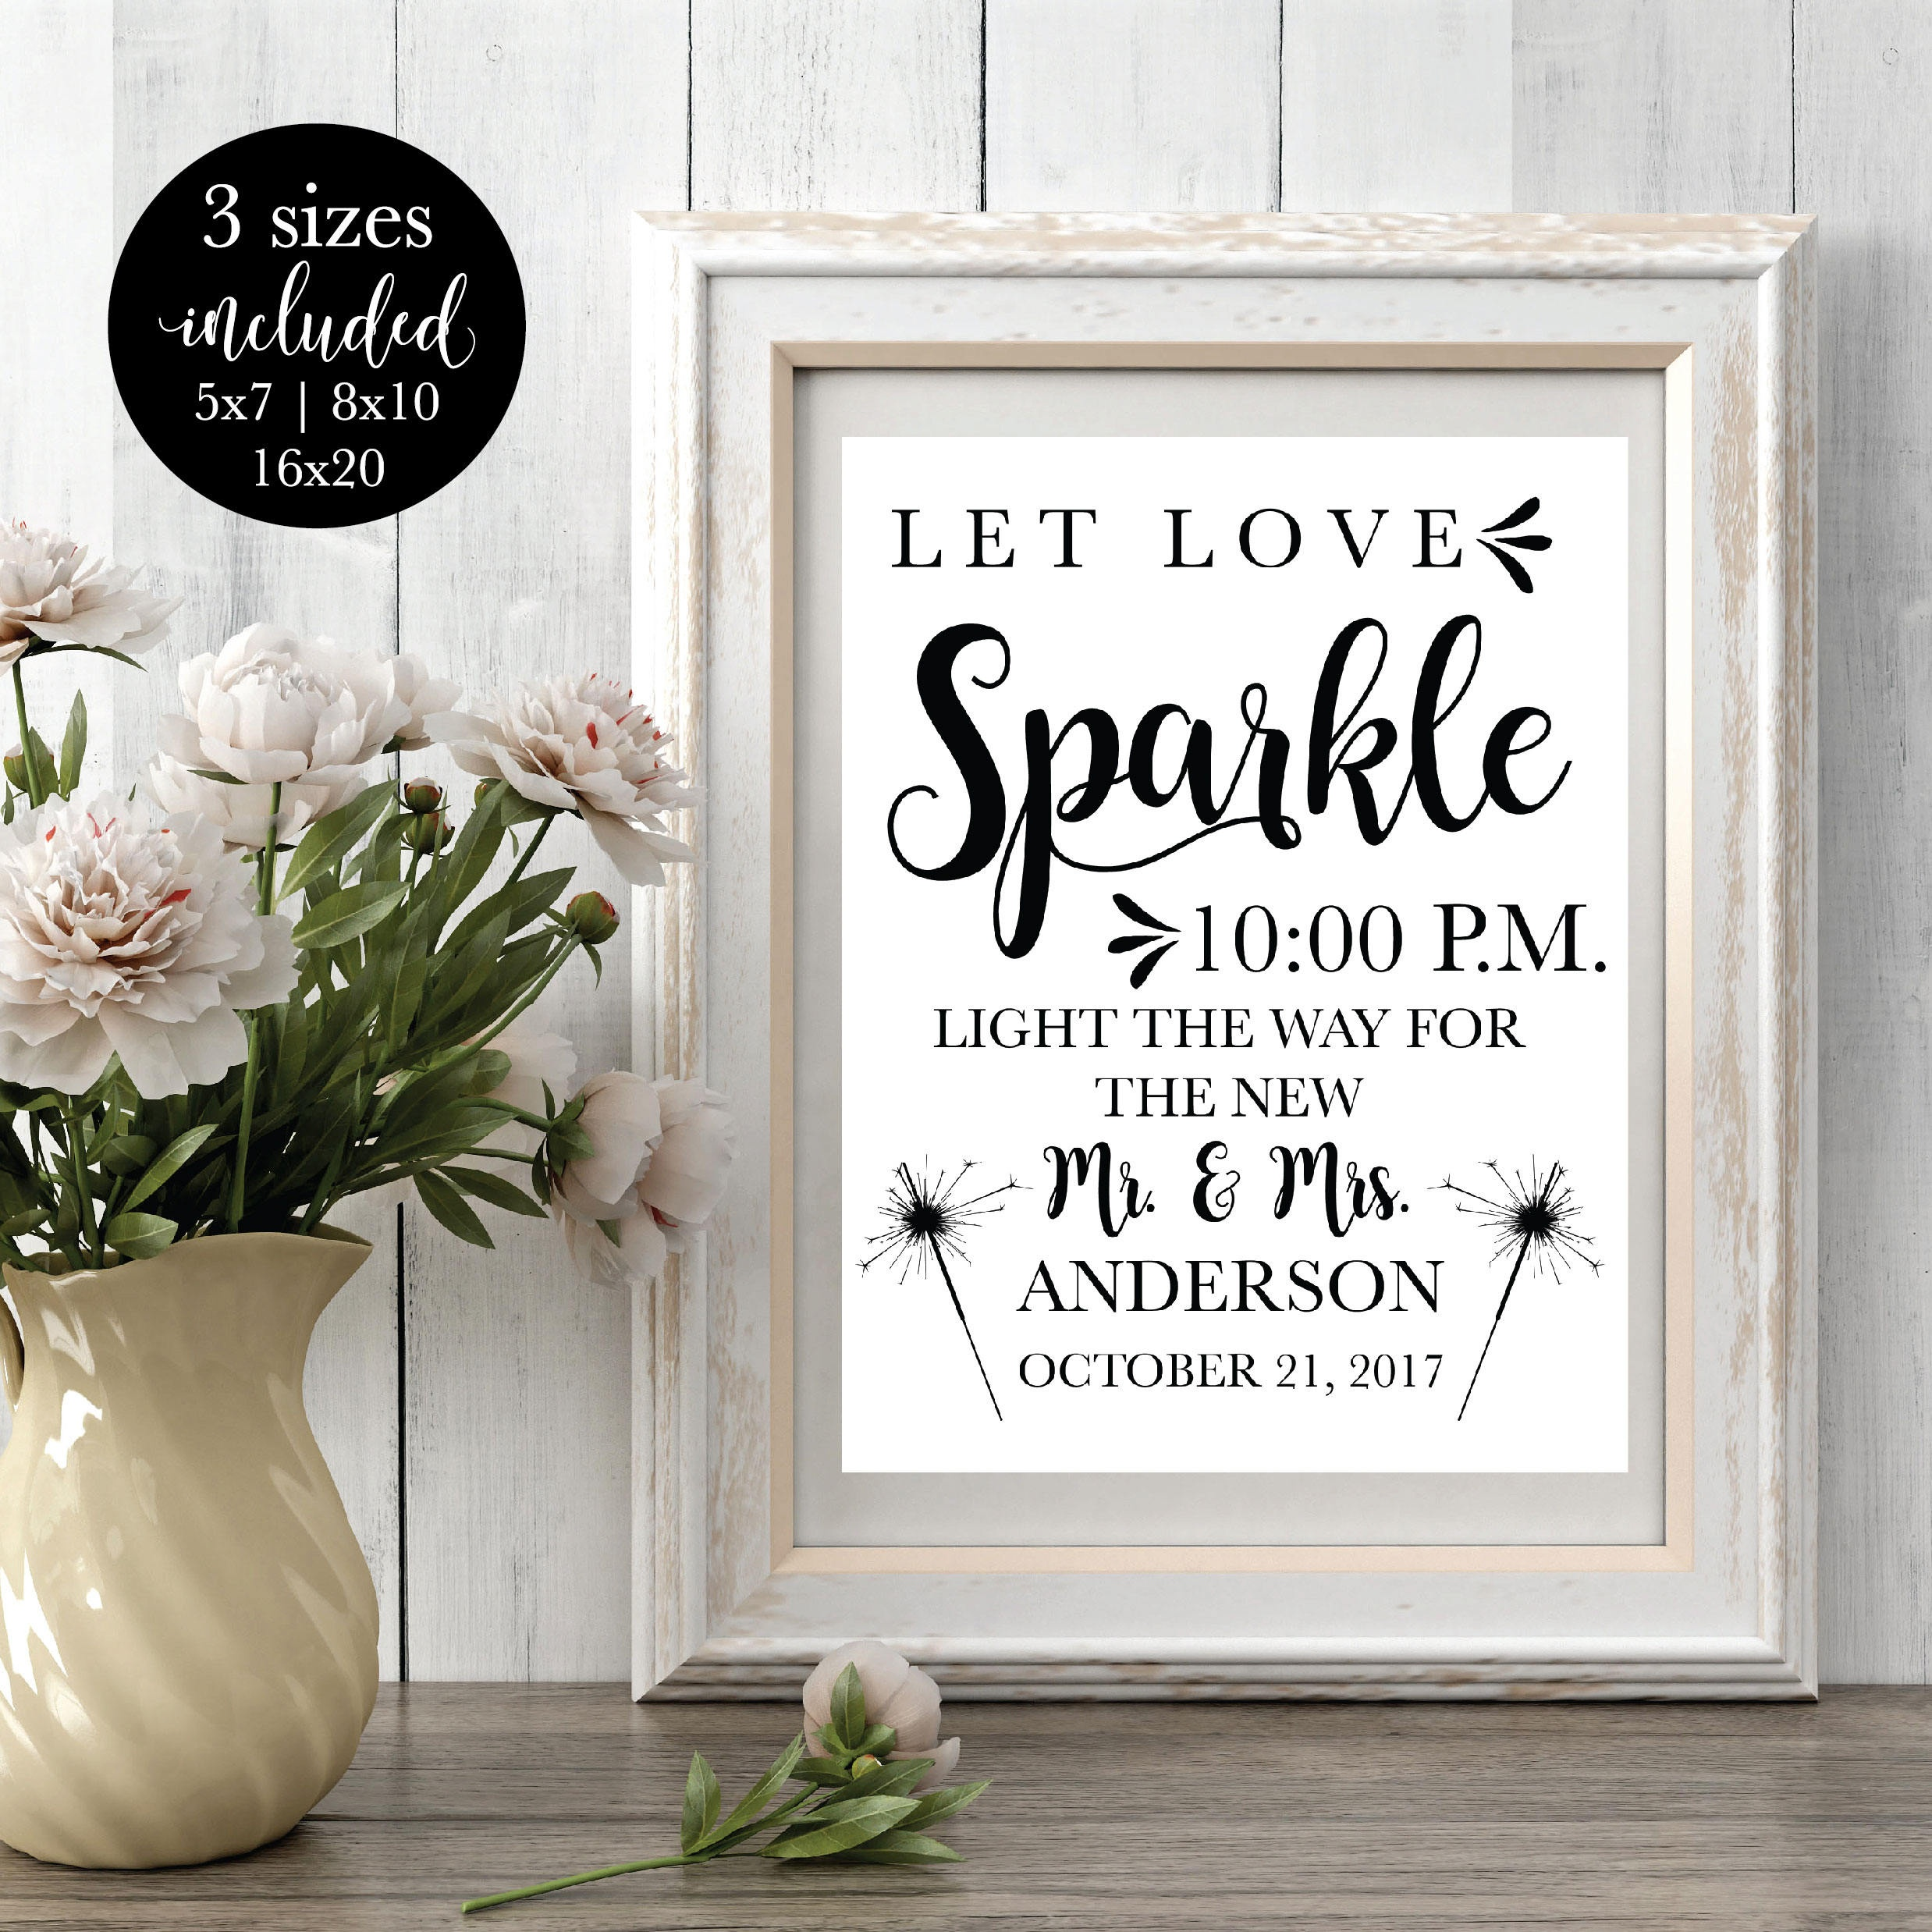 Printable Wedding Sparkler Sign Editable Reception Let Love | Etsy - Free Printable Wedding Sparkler Sign